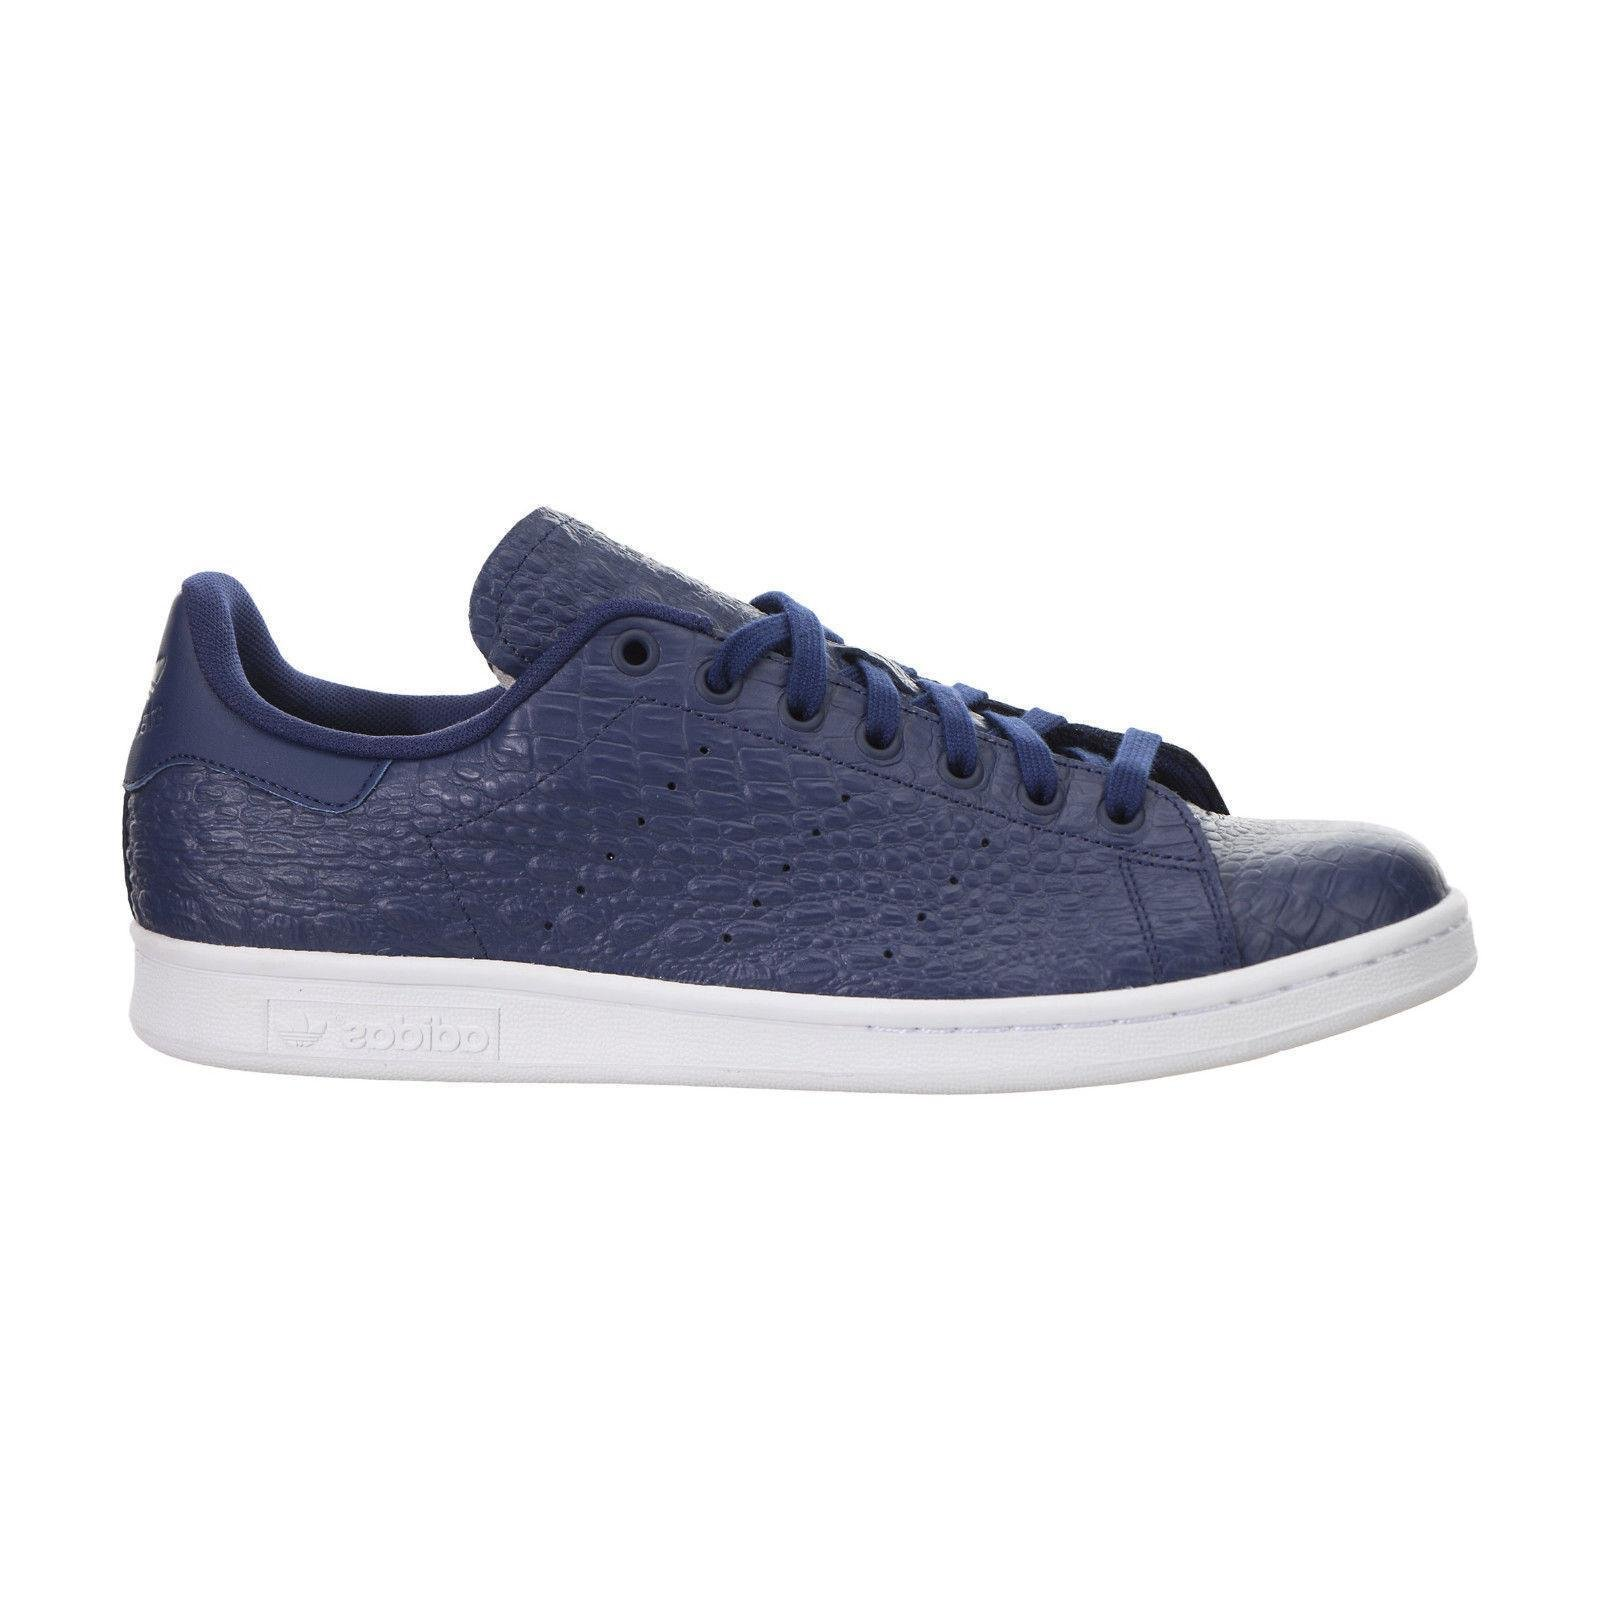 more photos 8728a a4b77 Galleon - Adidas Originals Stan Smith - Mens Mens Aq2730 Size 9